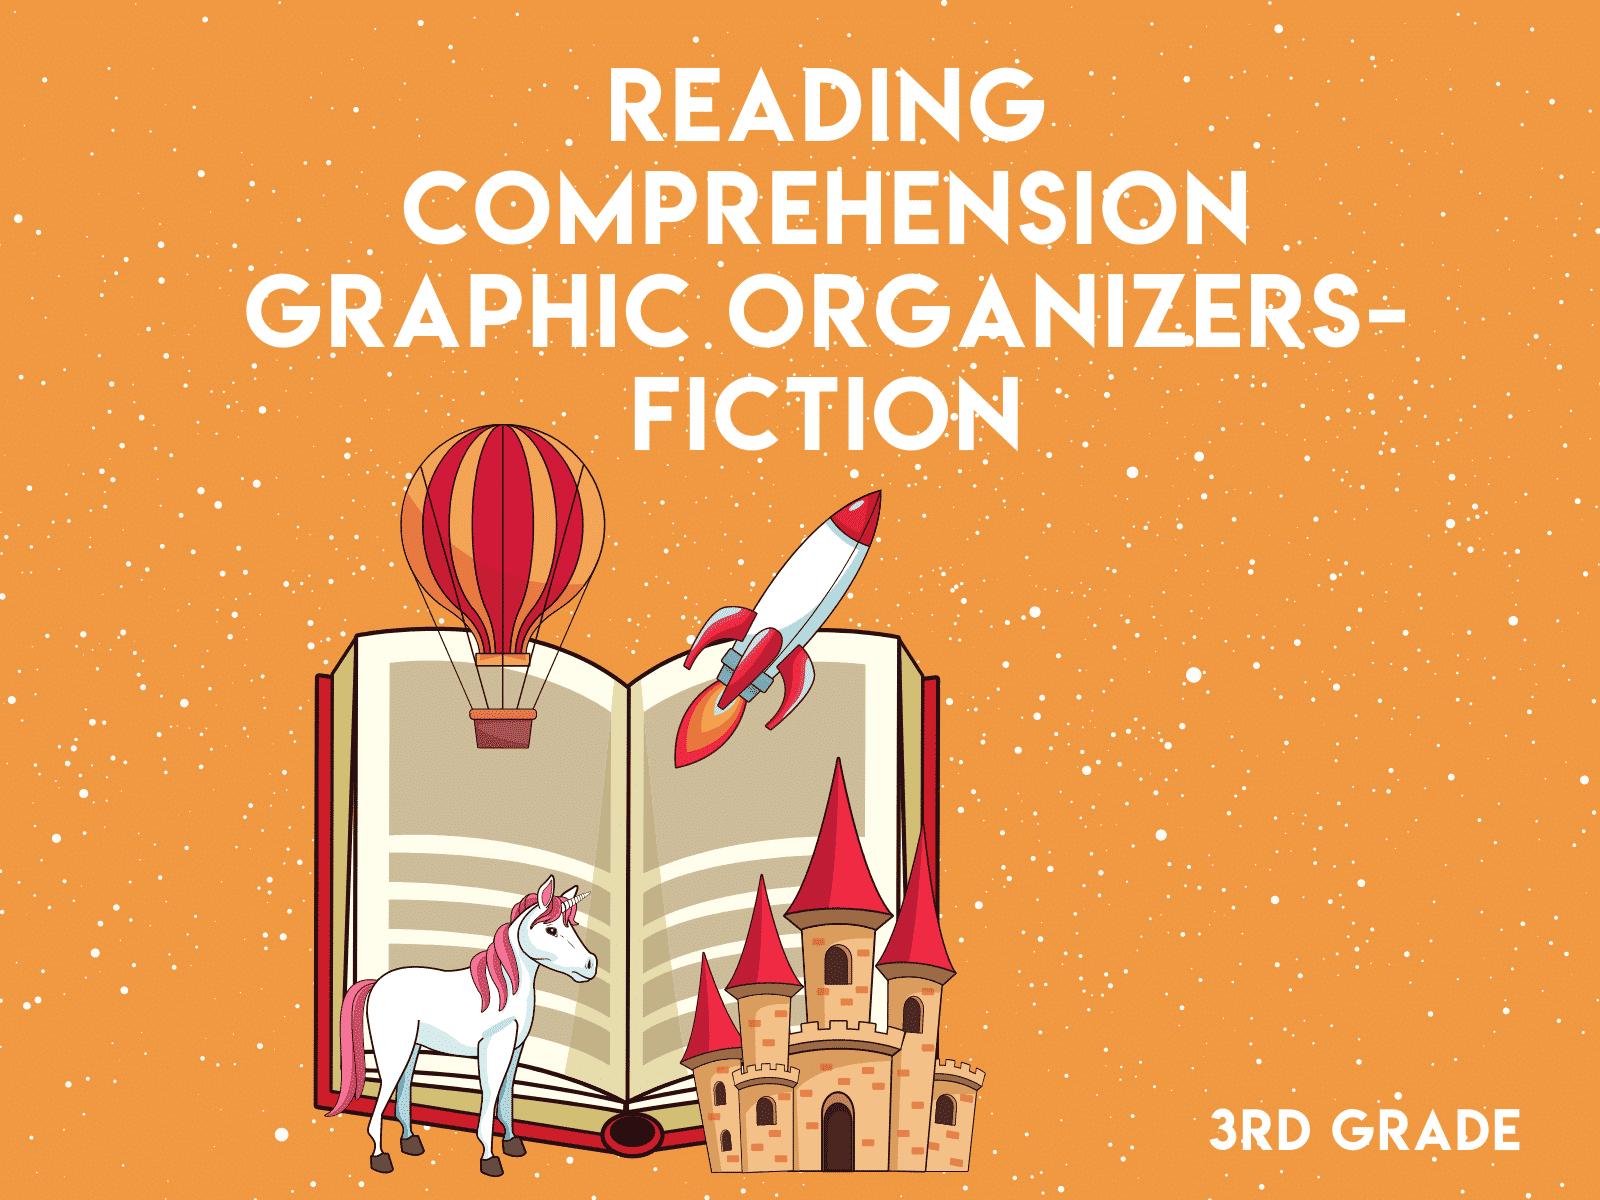 3rd Grade Fiction Reading Graphic Organizer